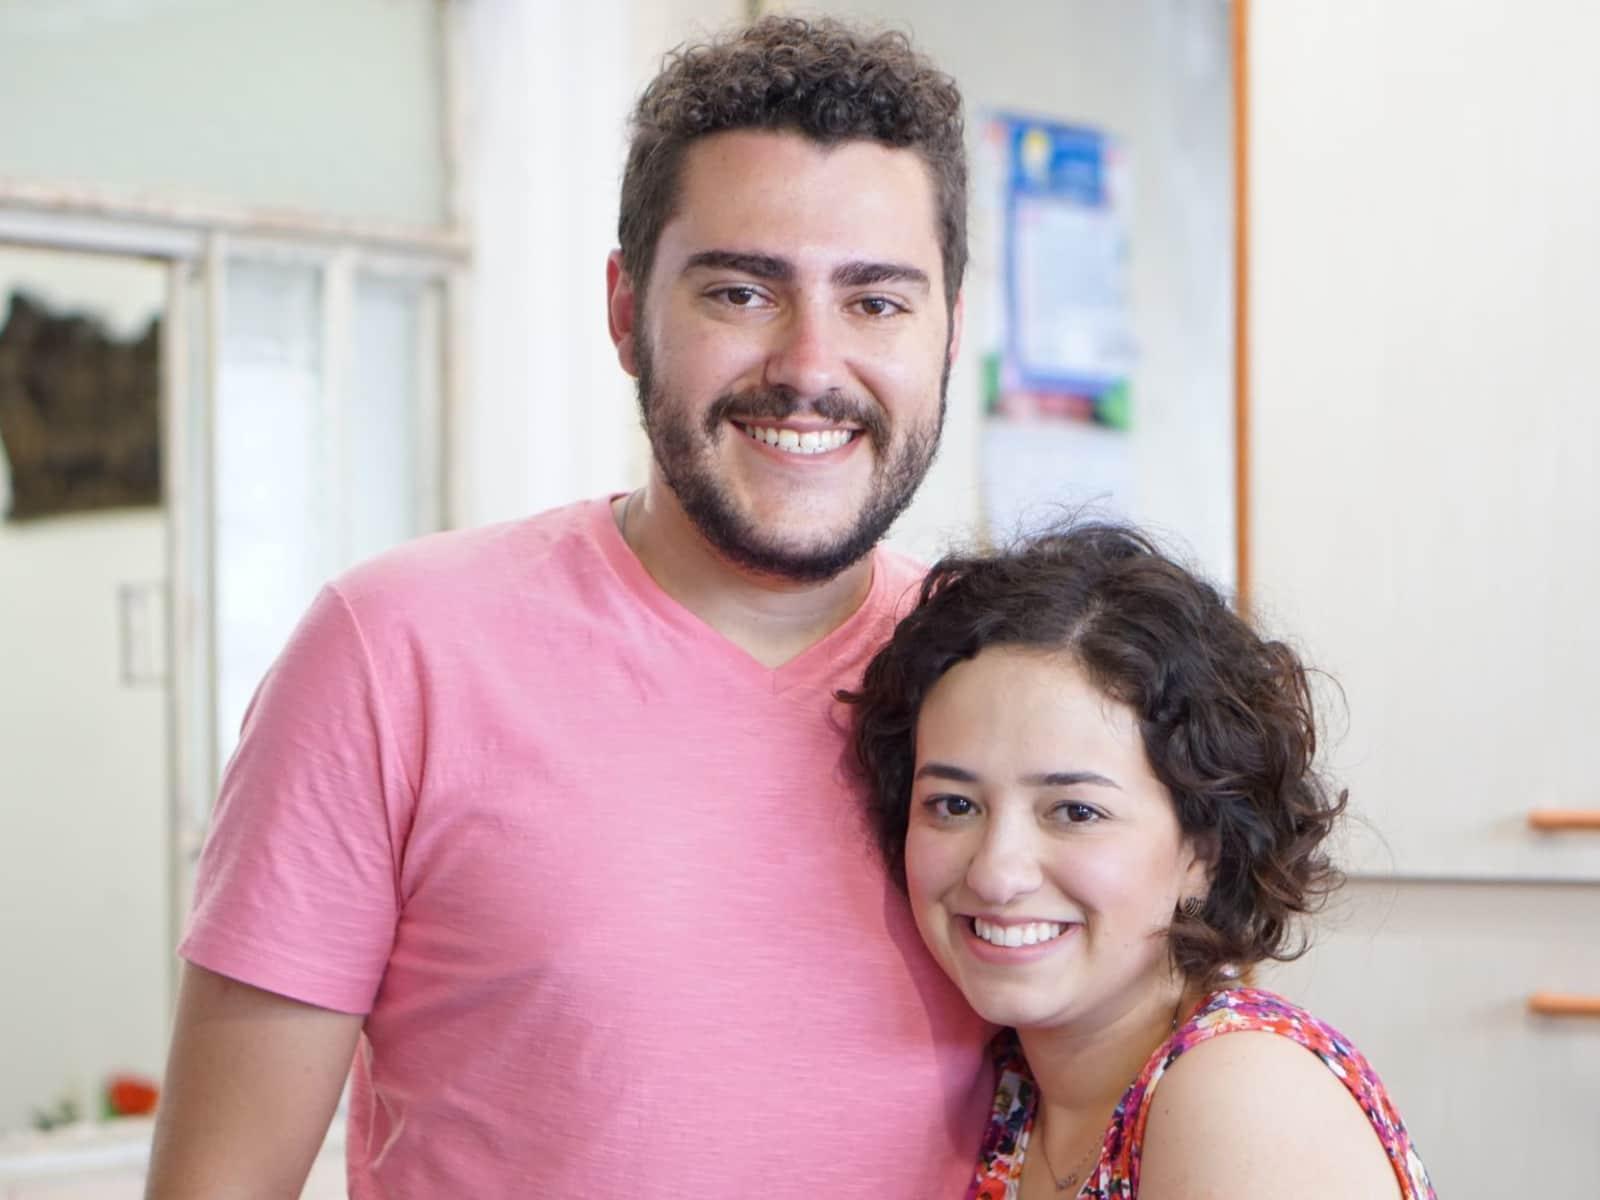 Juliana & Leonardo augusto from São Paulo, Brazil